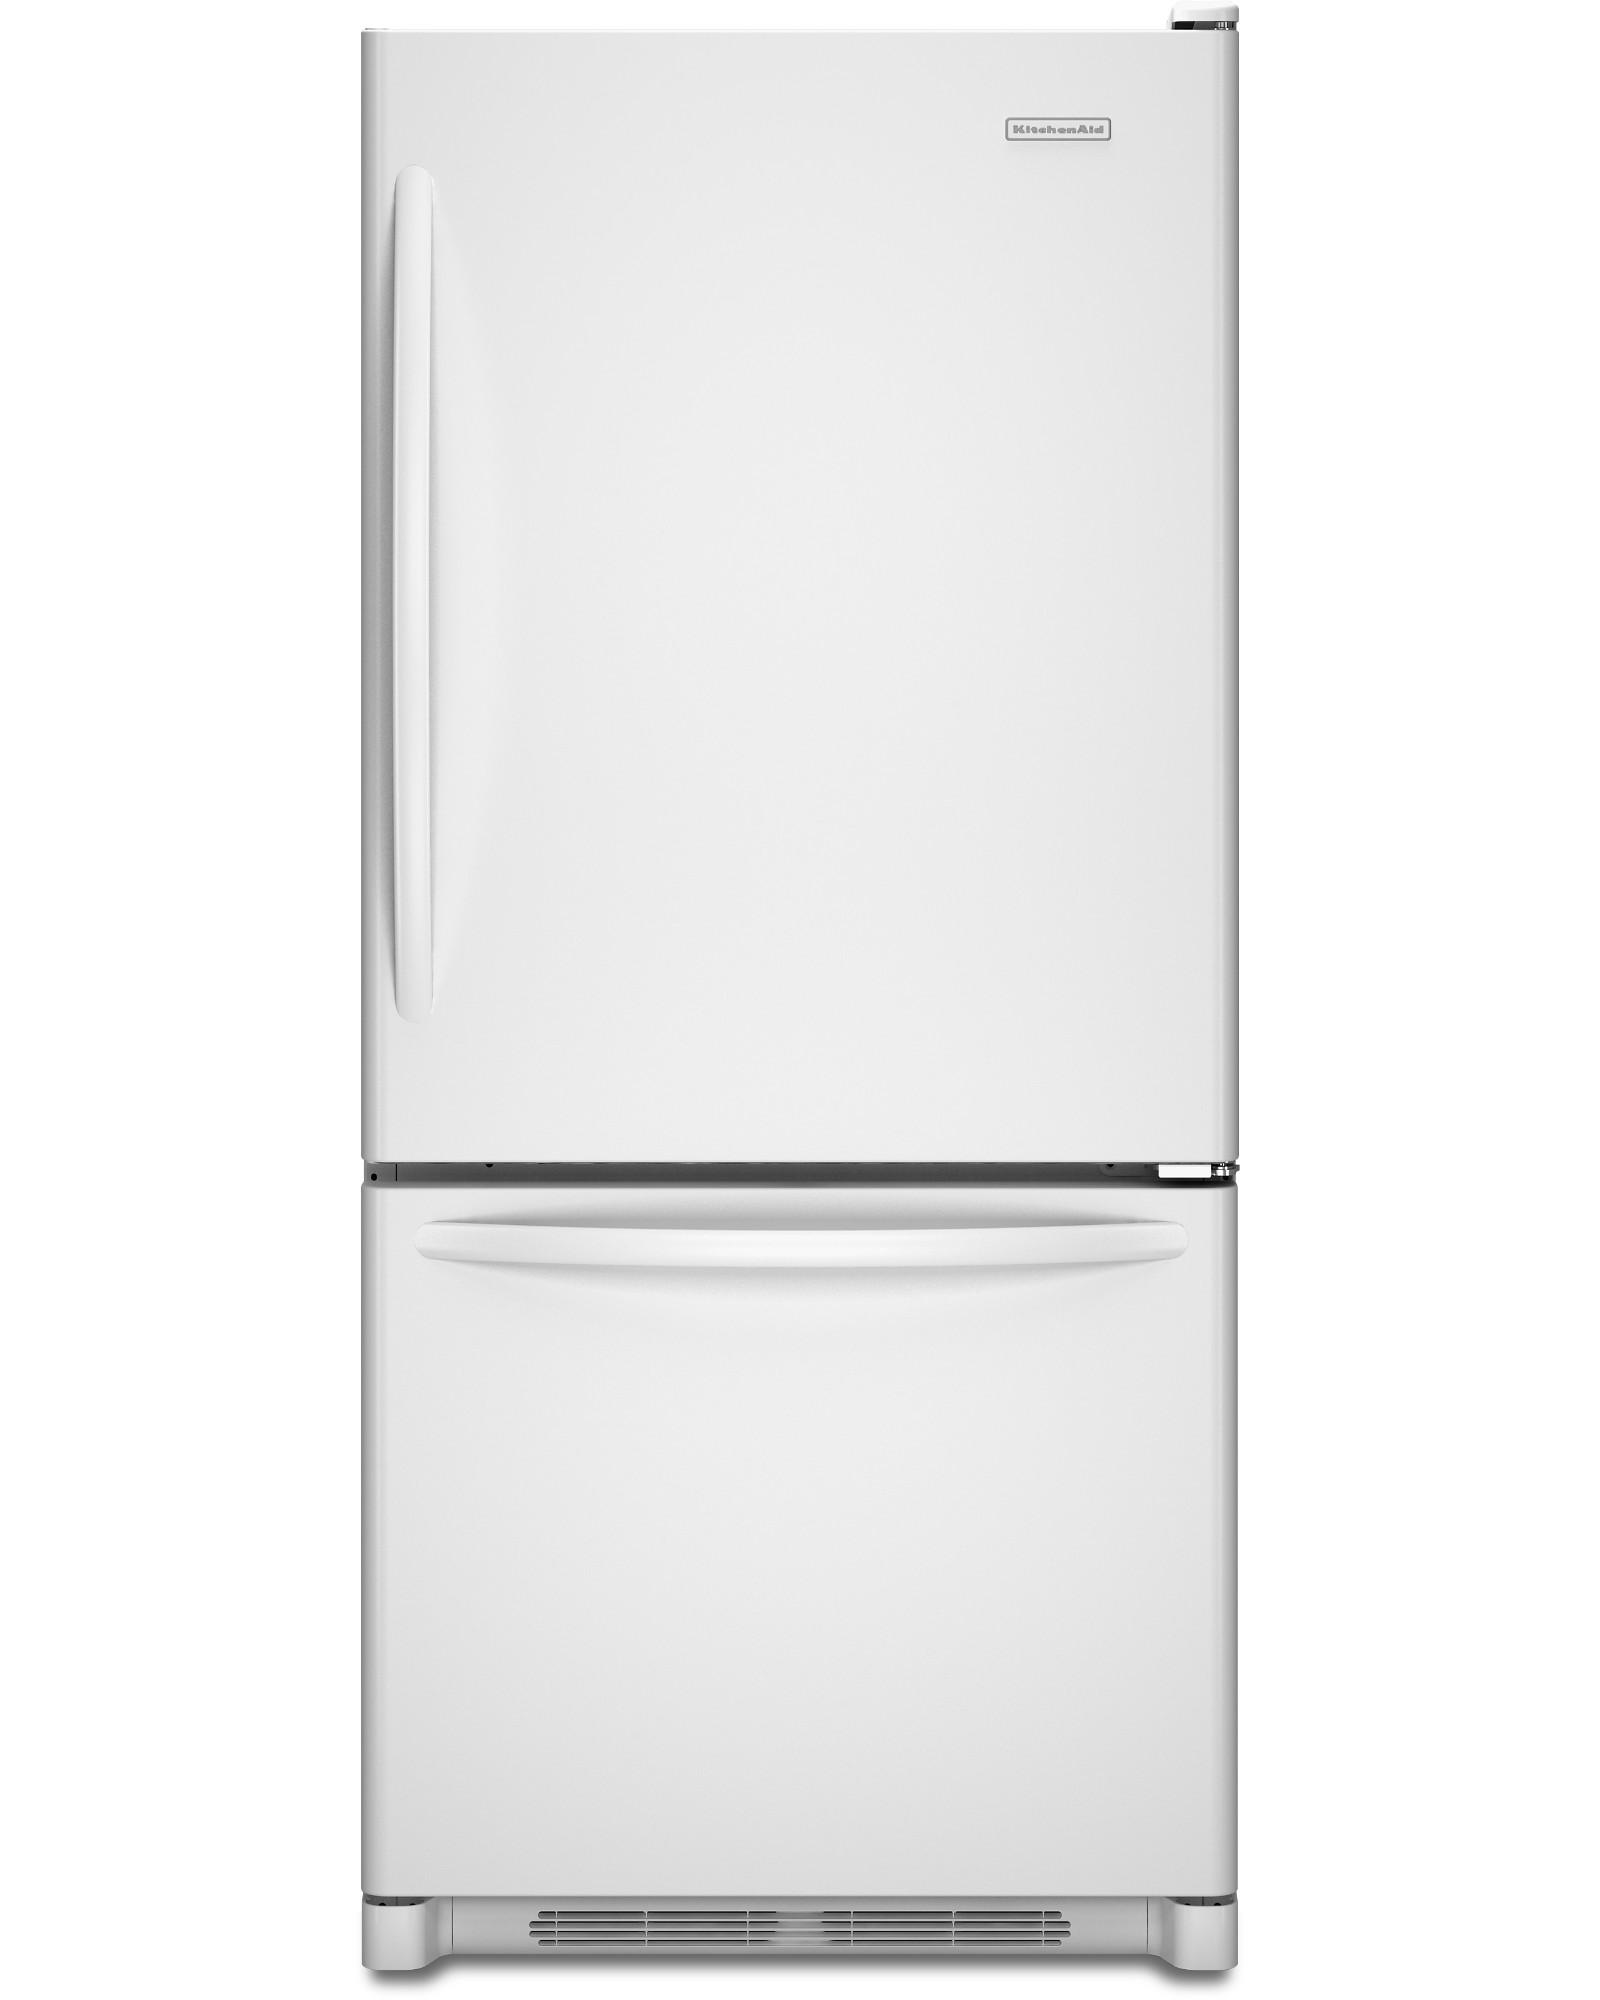 KitchenAid KBWS19KCWH 18.7 cu. ft. Single Door Bottom Freezer Refrigerator w/ Produce Preserver - White PartNumber: 04606902000P KsnValue: 04606902000 MfgPartNumber: KBWS19KCWH